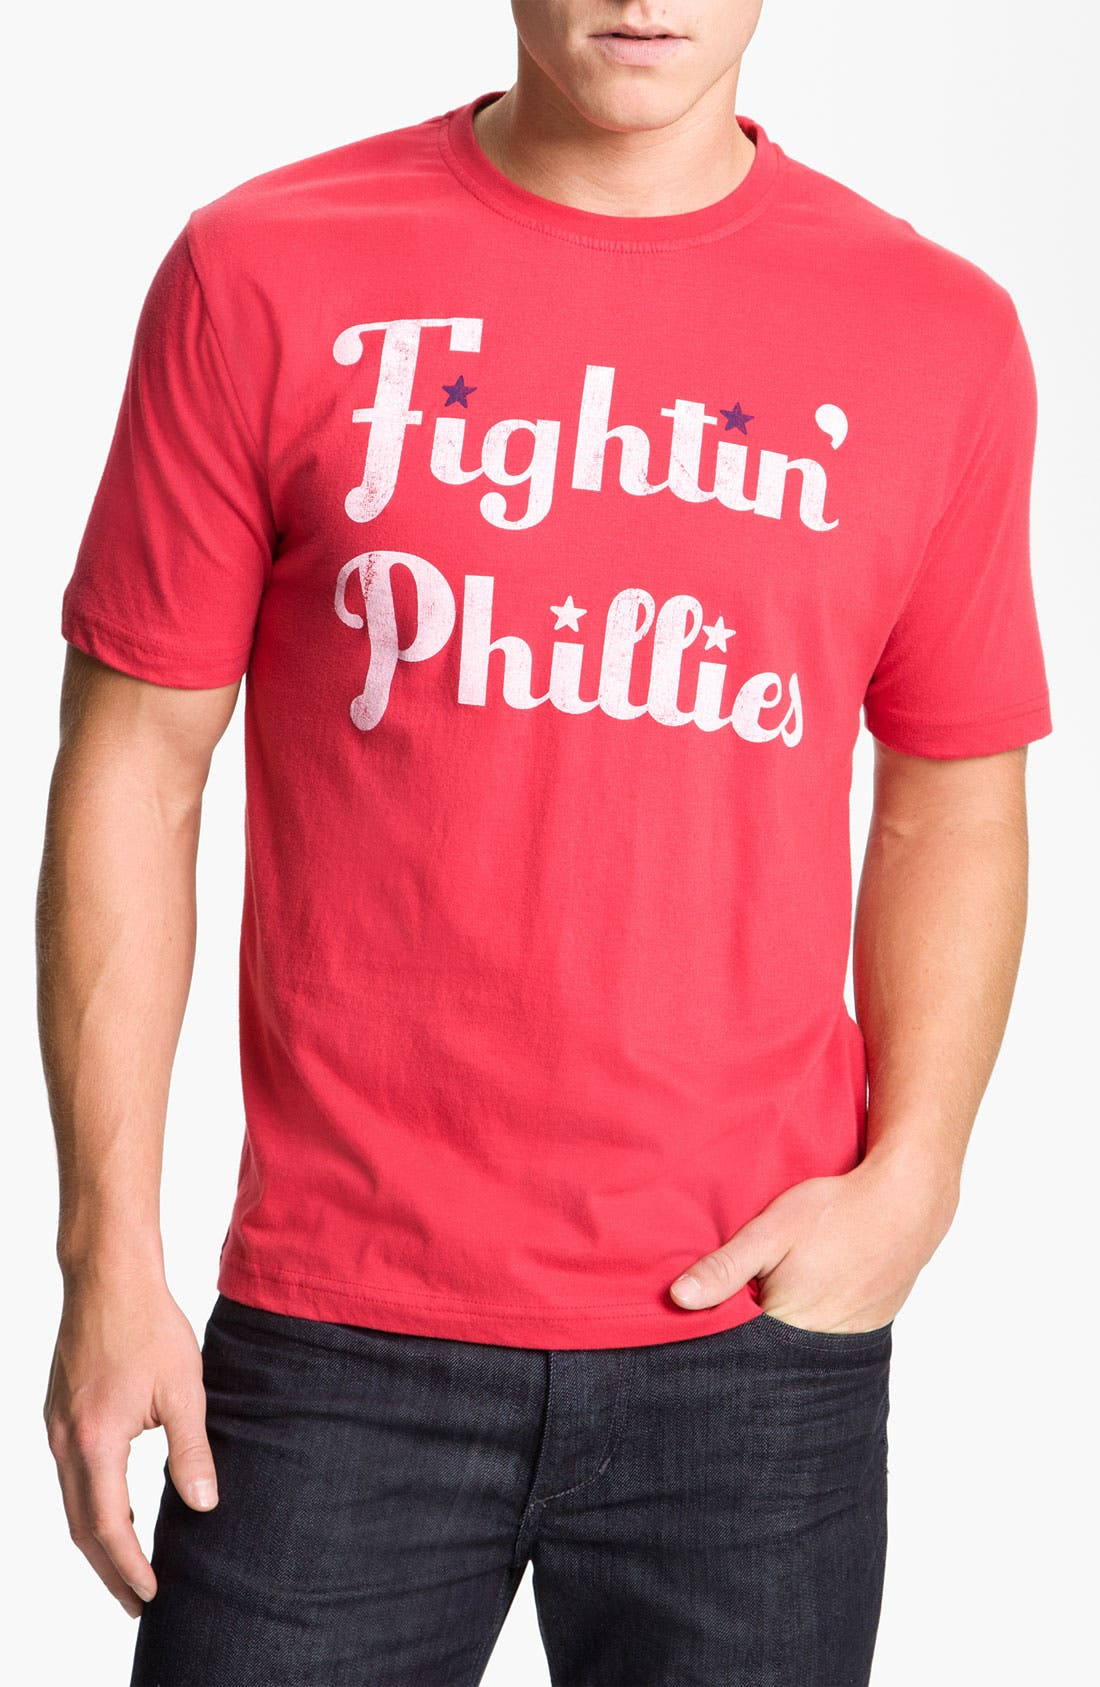 Main Image - Wright & Ditson 'Philadelphia Phillies' Baseball T-Shirt